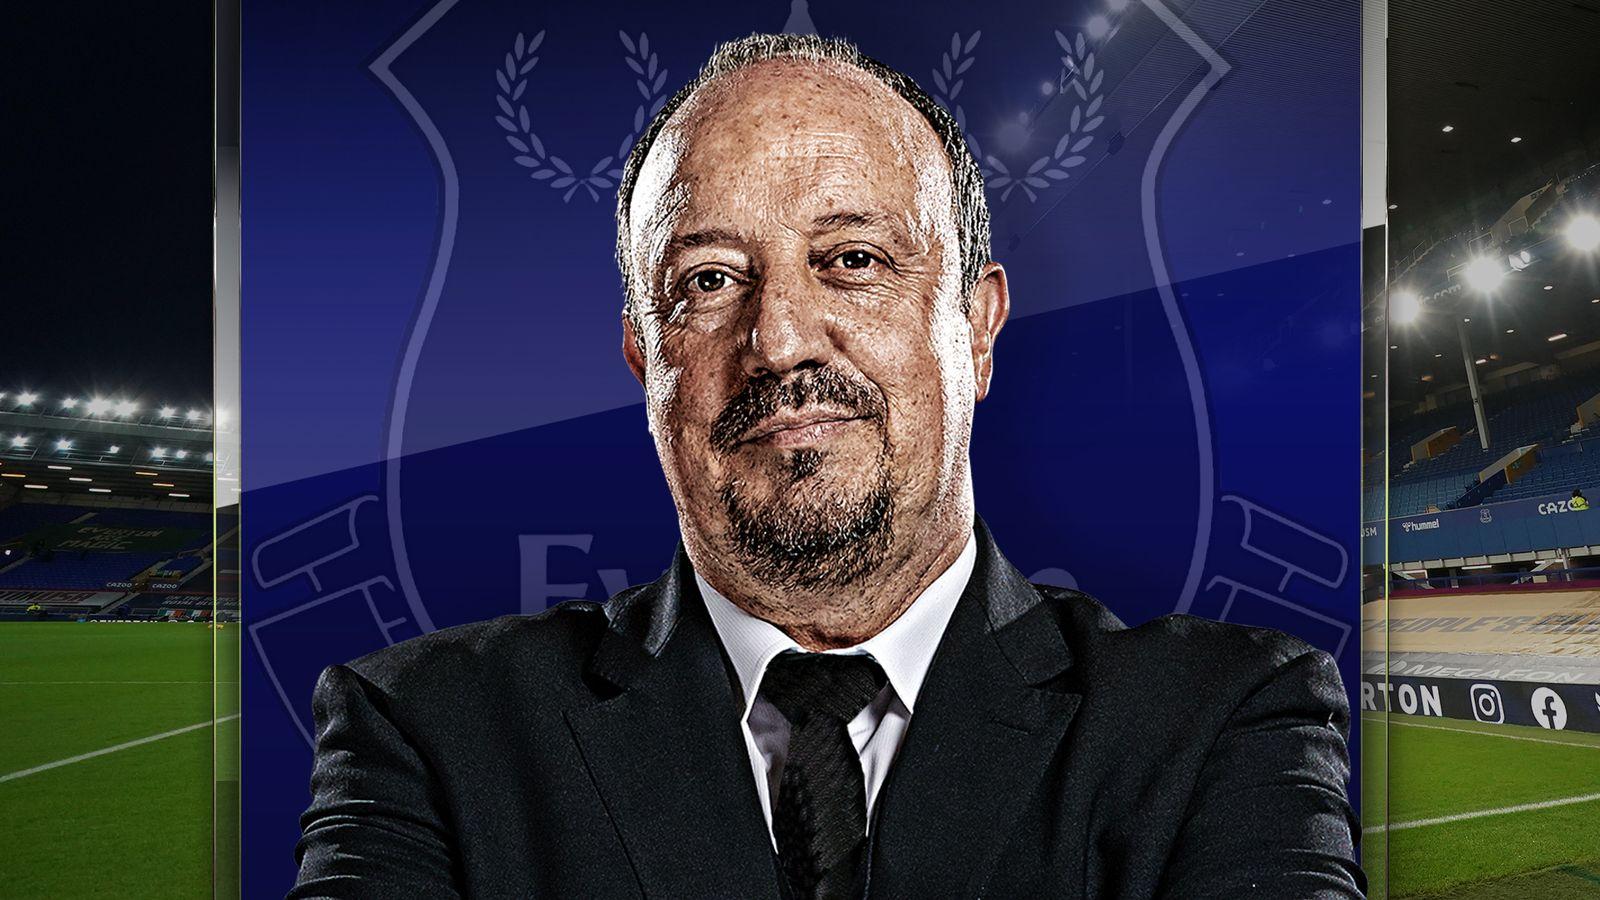 Everton reporter notebook: Rafa Benitez should expect short honeymoon period